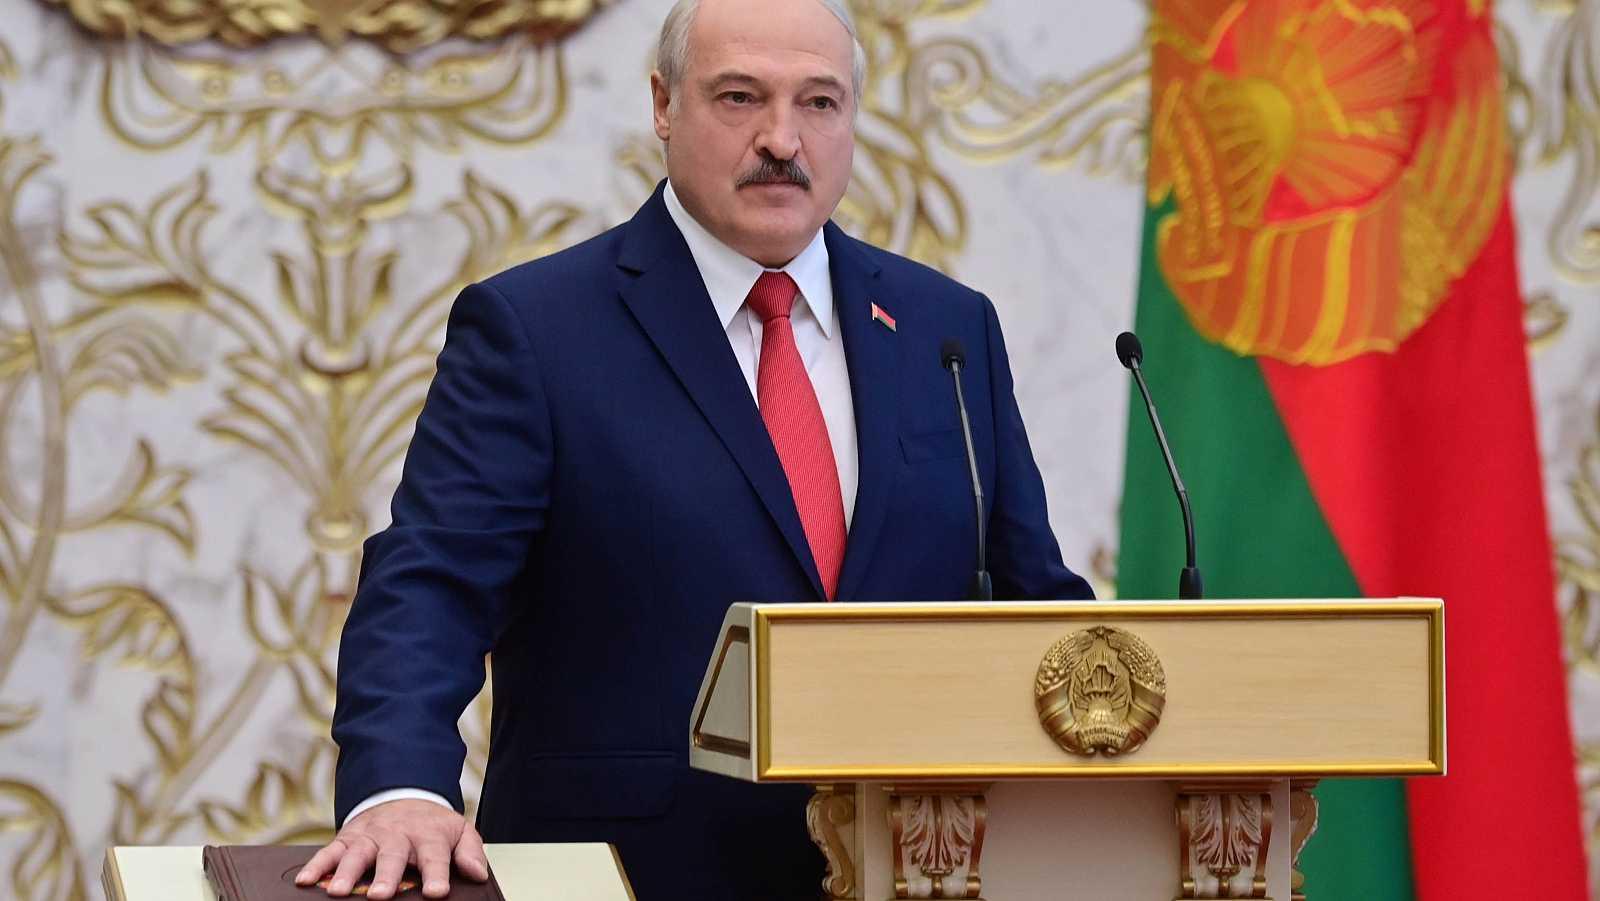 Alexander Lukashenko toma posesión como presidente de Bielorrusia jurando sobre la Constitución del país.